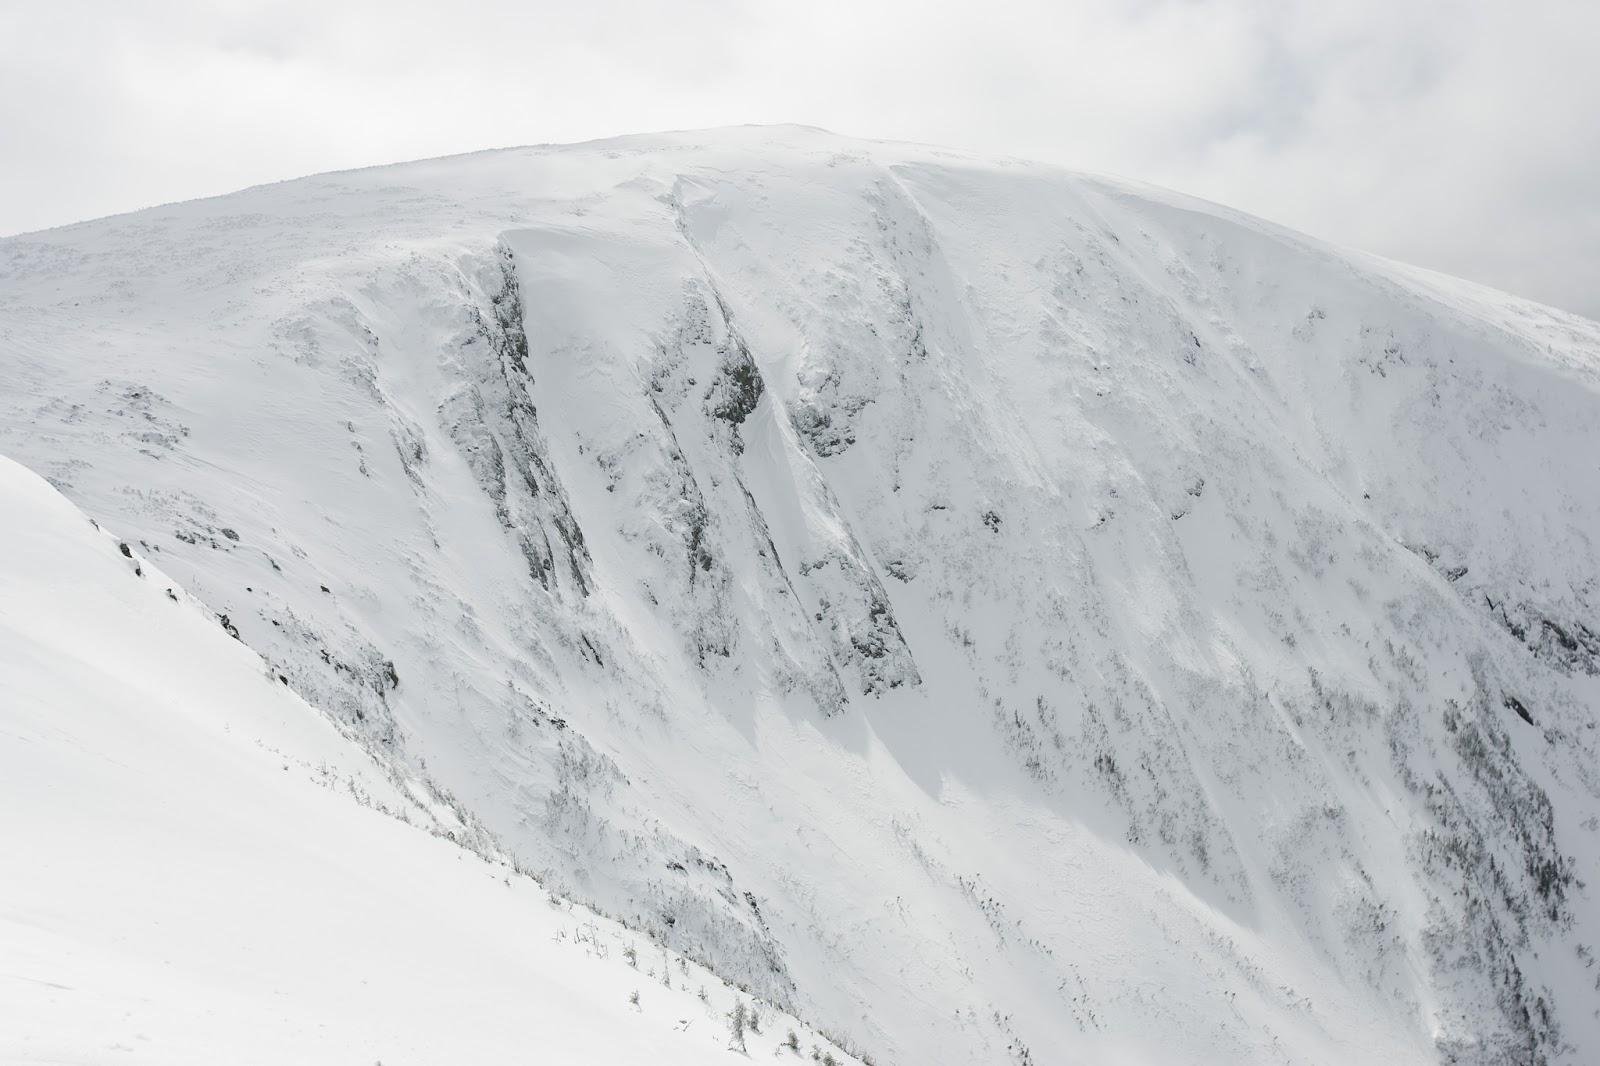 exploring-canada-winter-skiing-chic-chocs